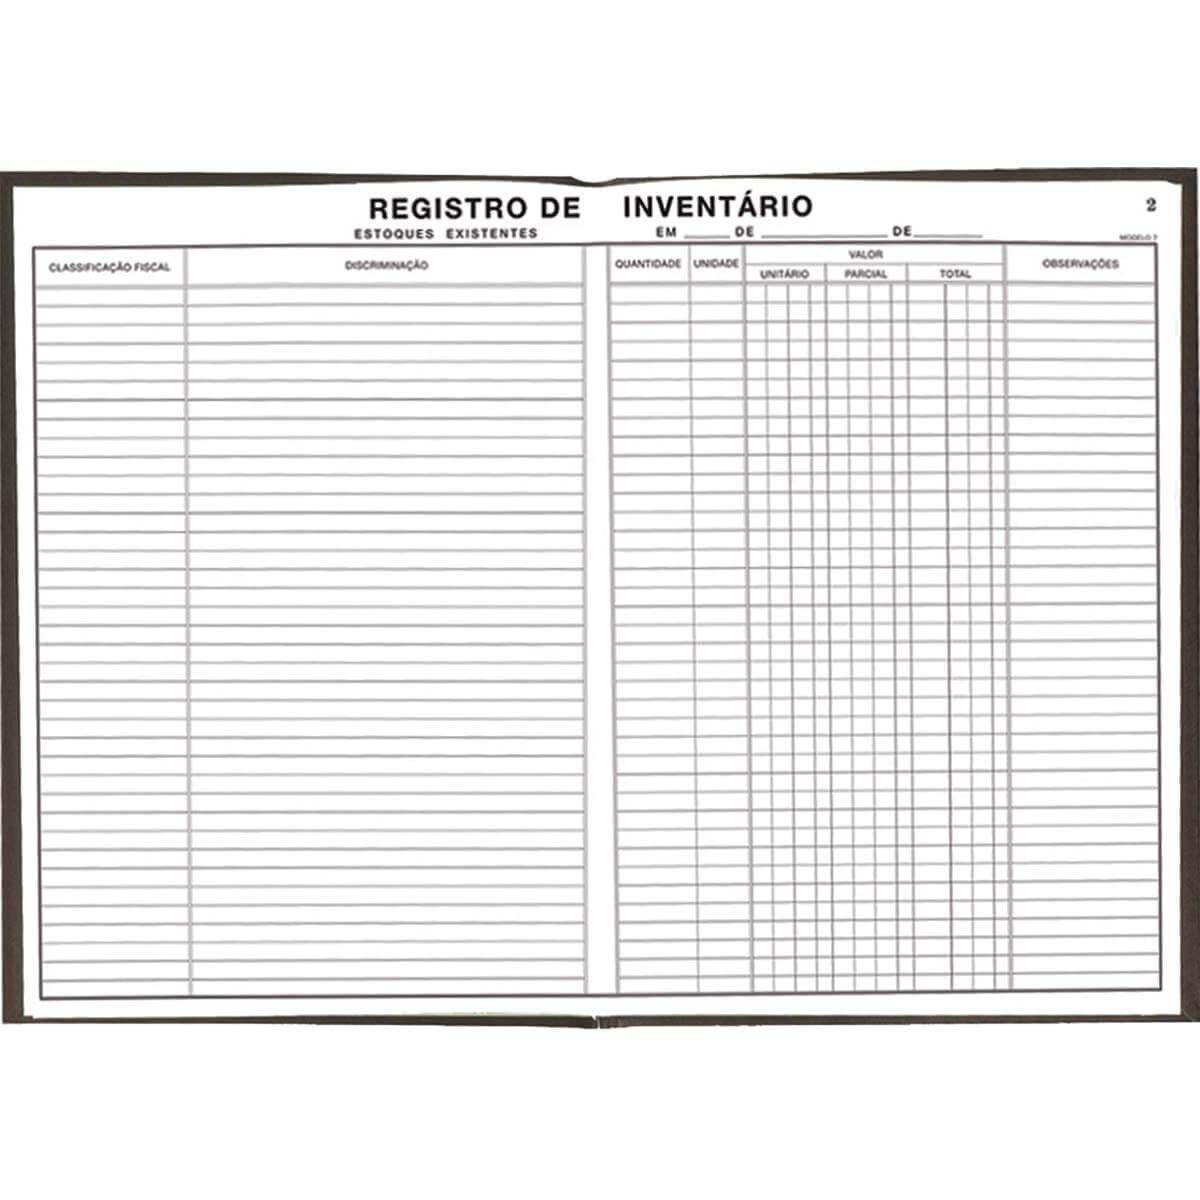 Livro Registro Tilibra Inventario Mod.7 50 Fls 121177 15897